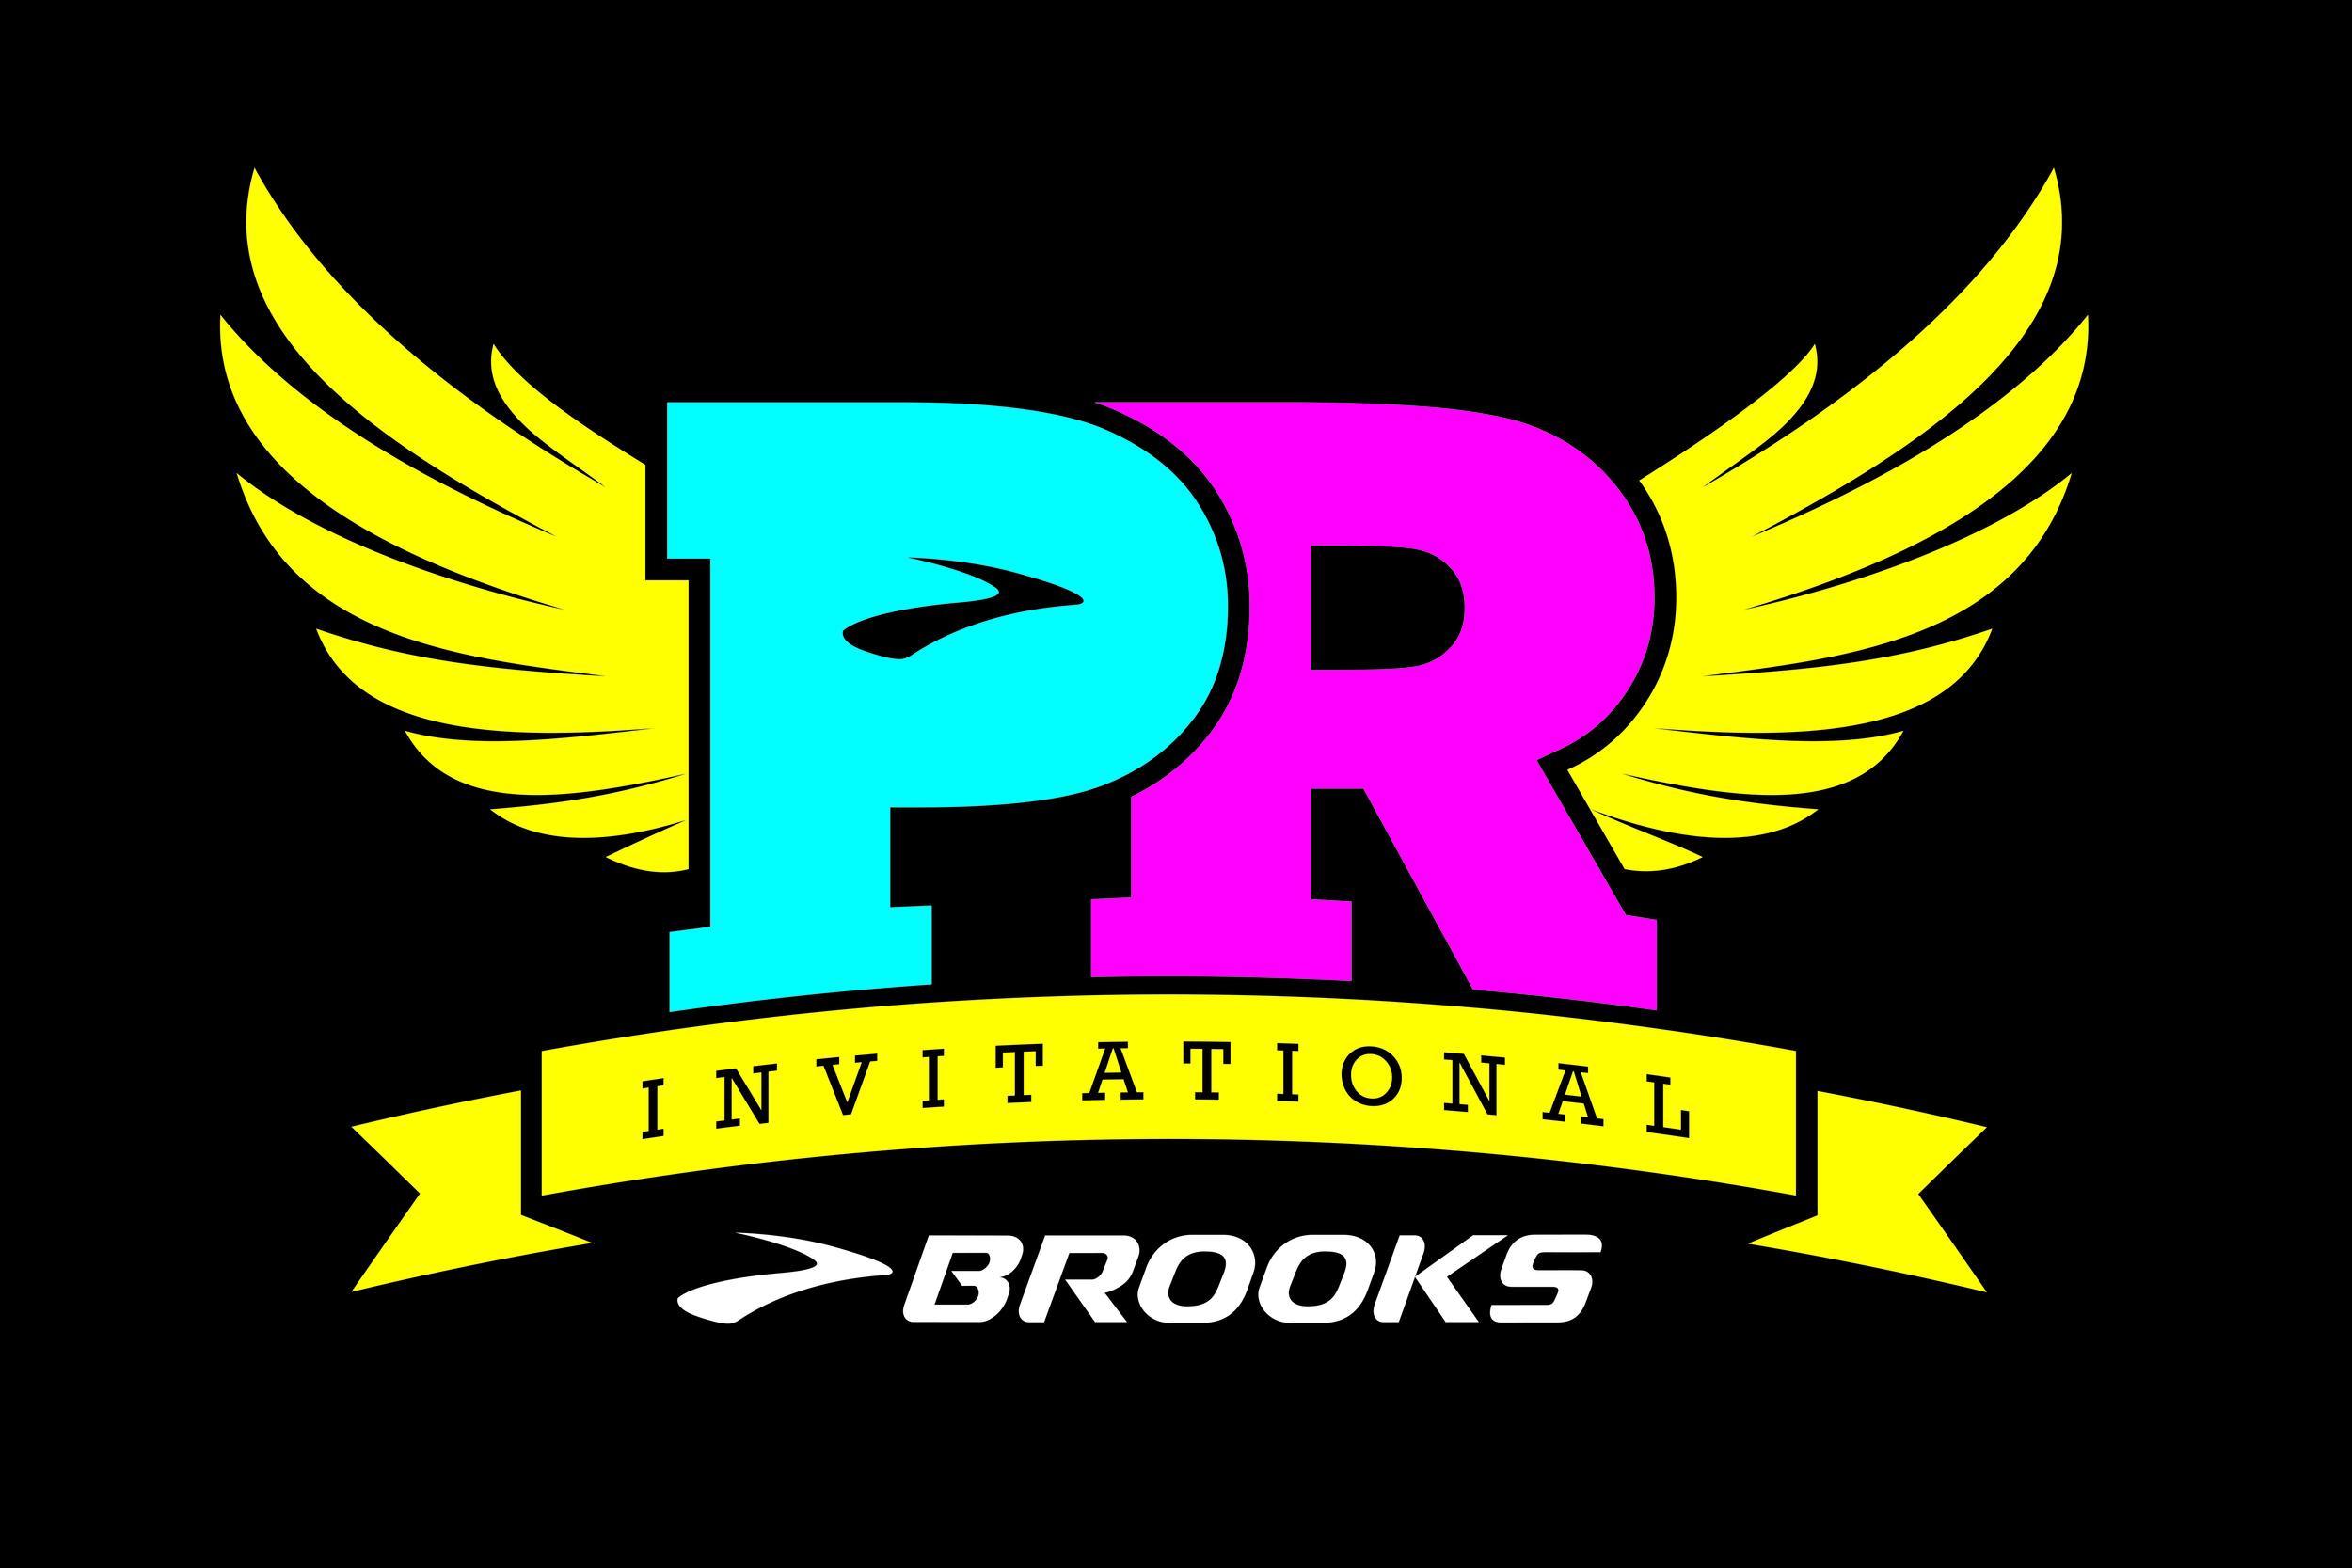 2014_Brooks_PR_logo.jpg